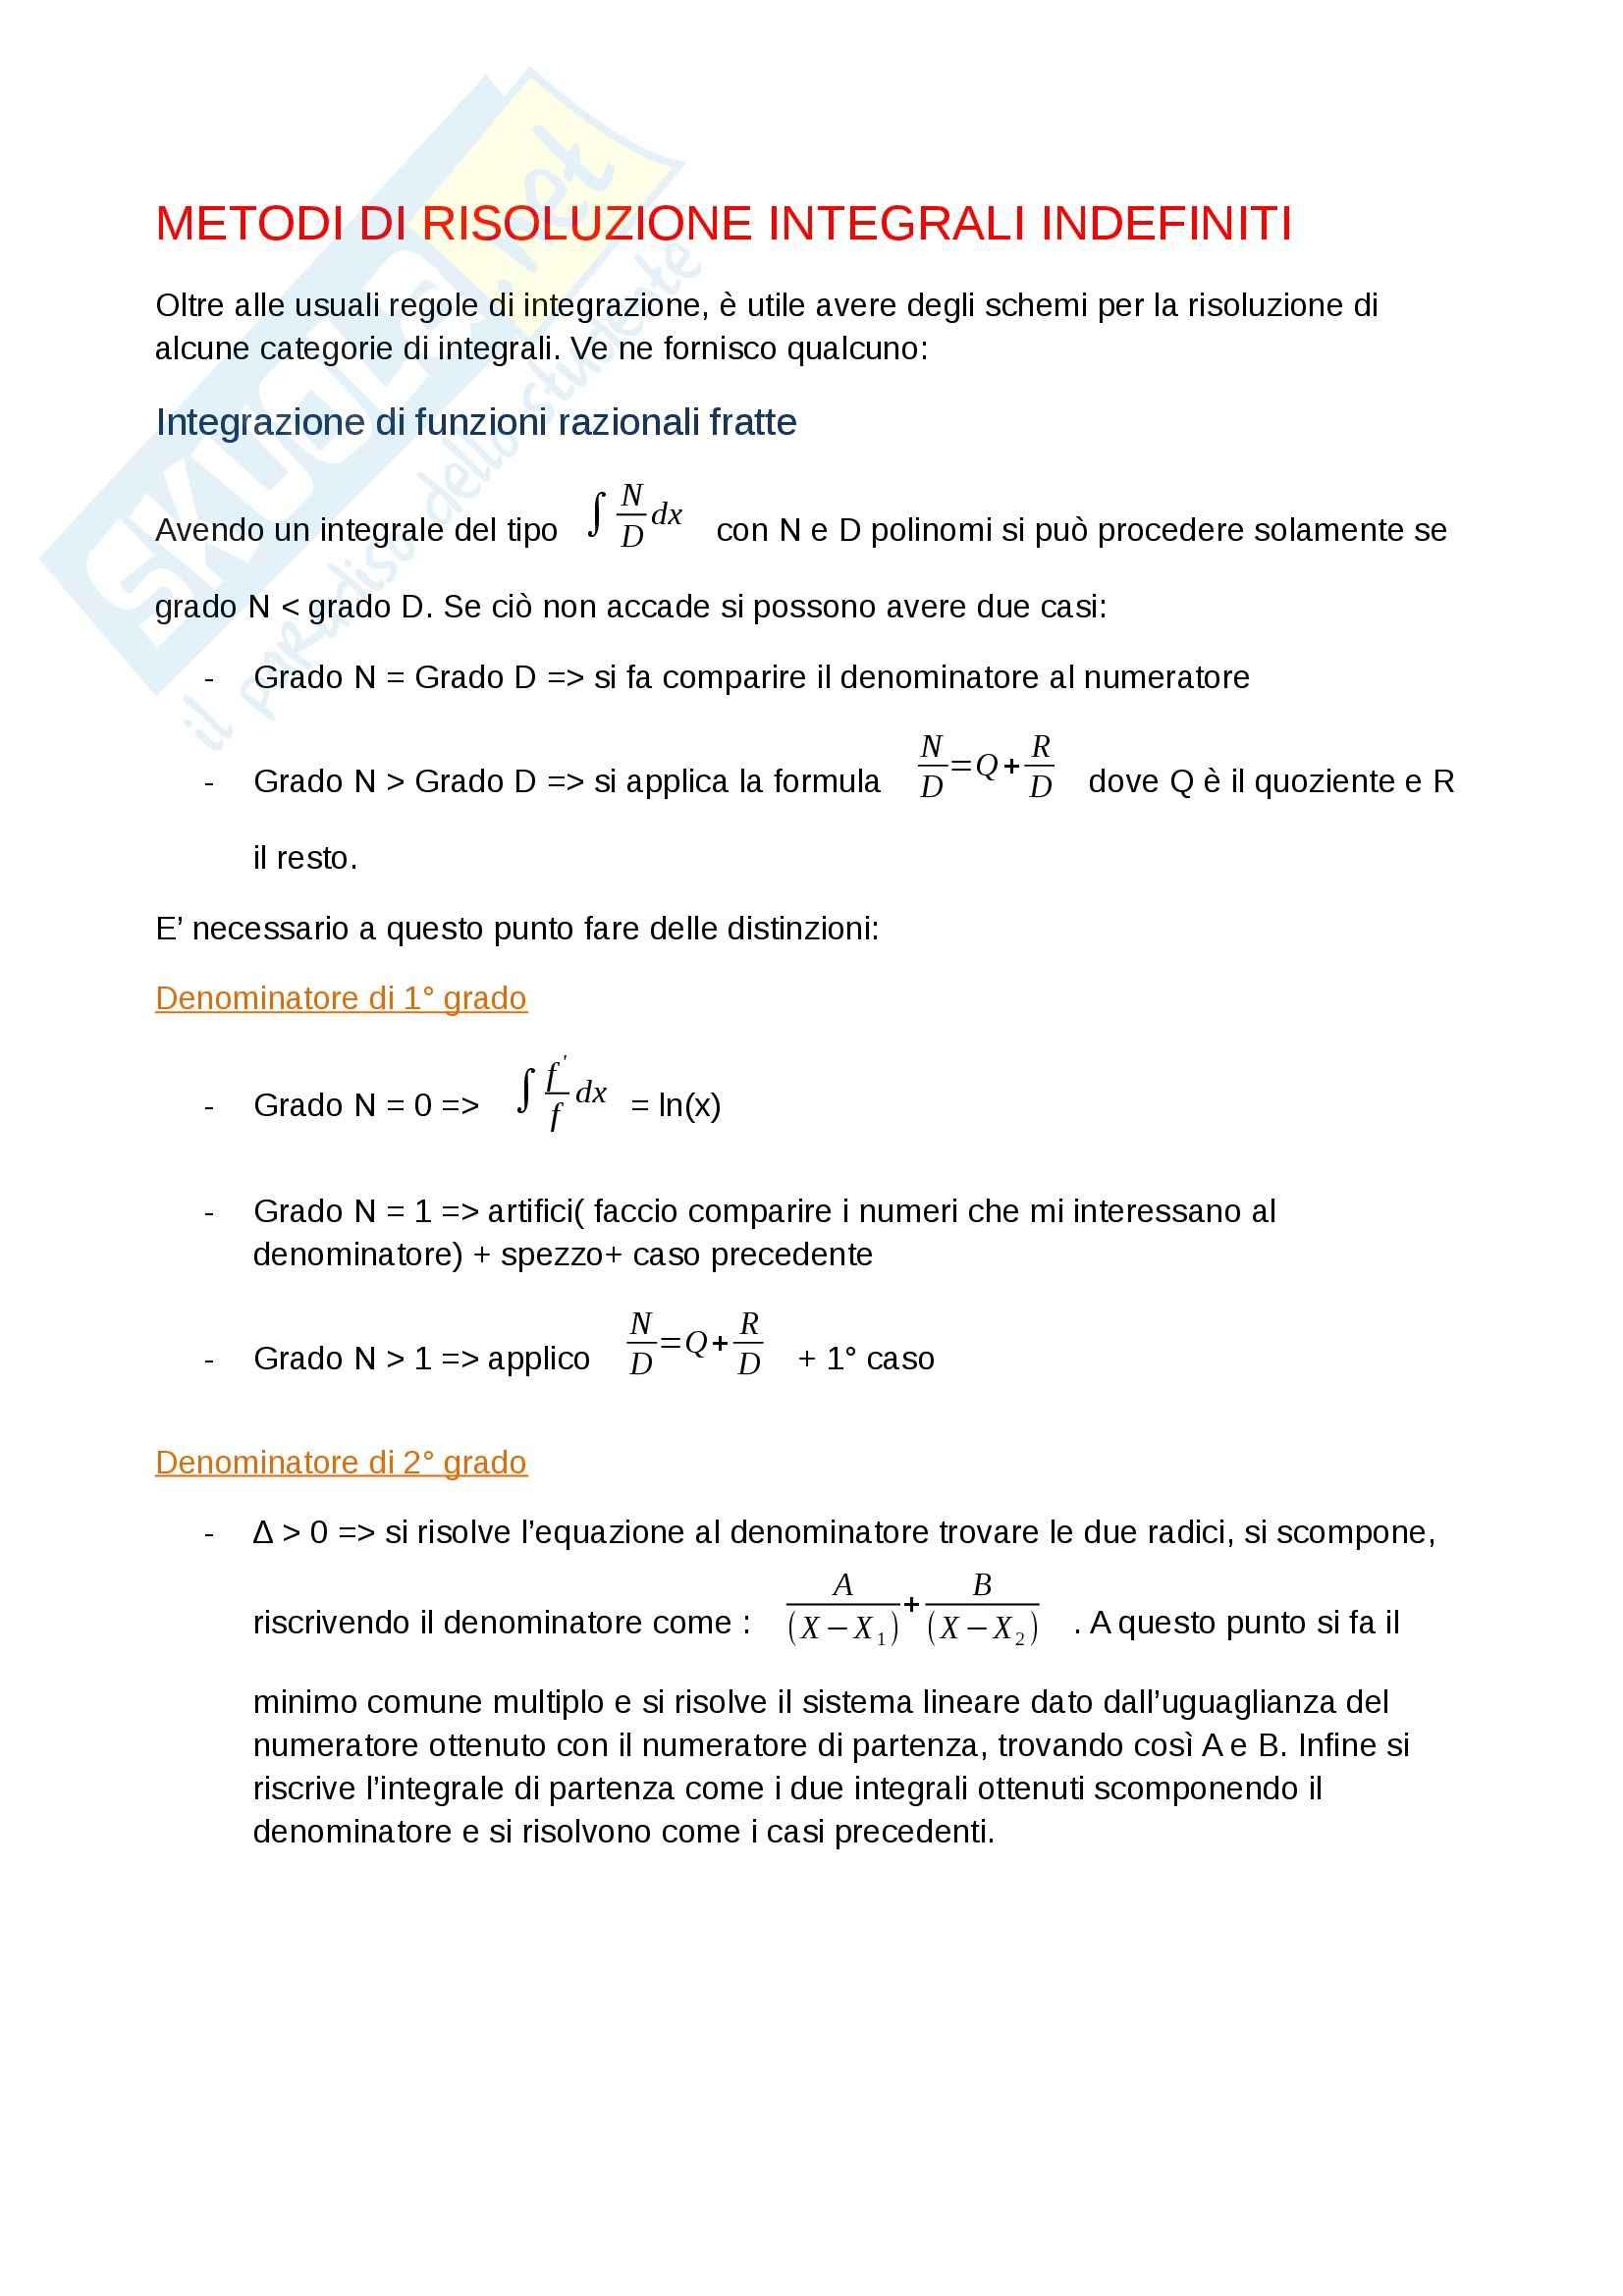 Metodi dettagliati di risoluzione degli integrali indefiniti, Analisi matematica I